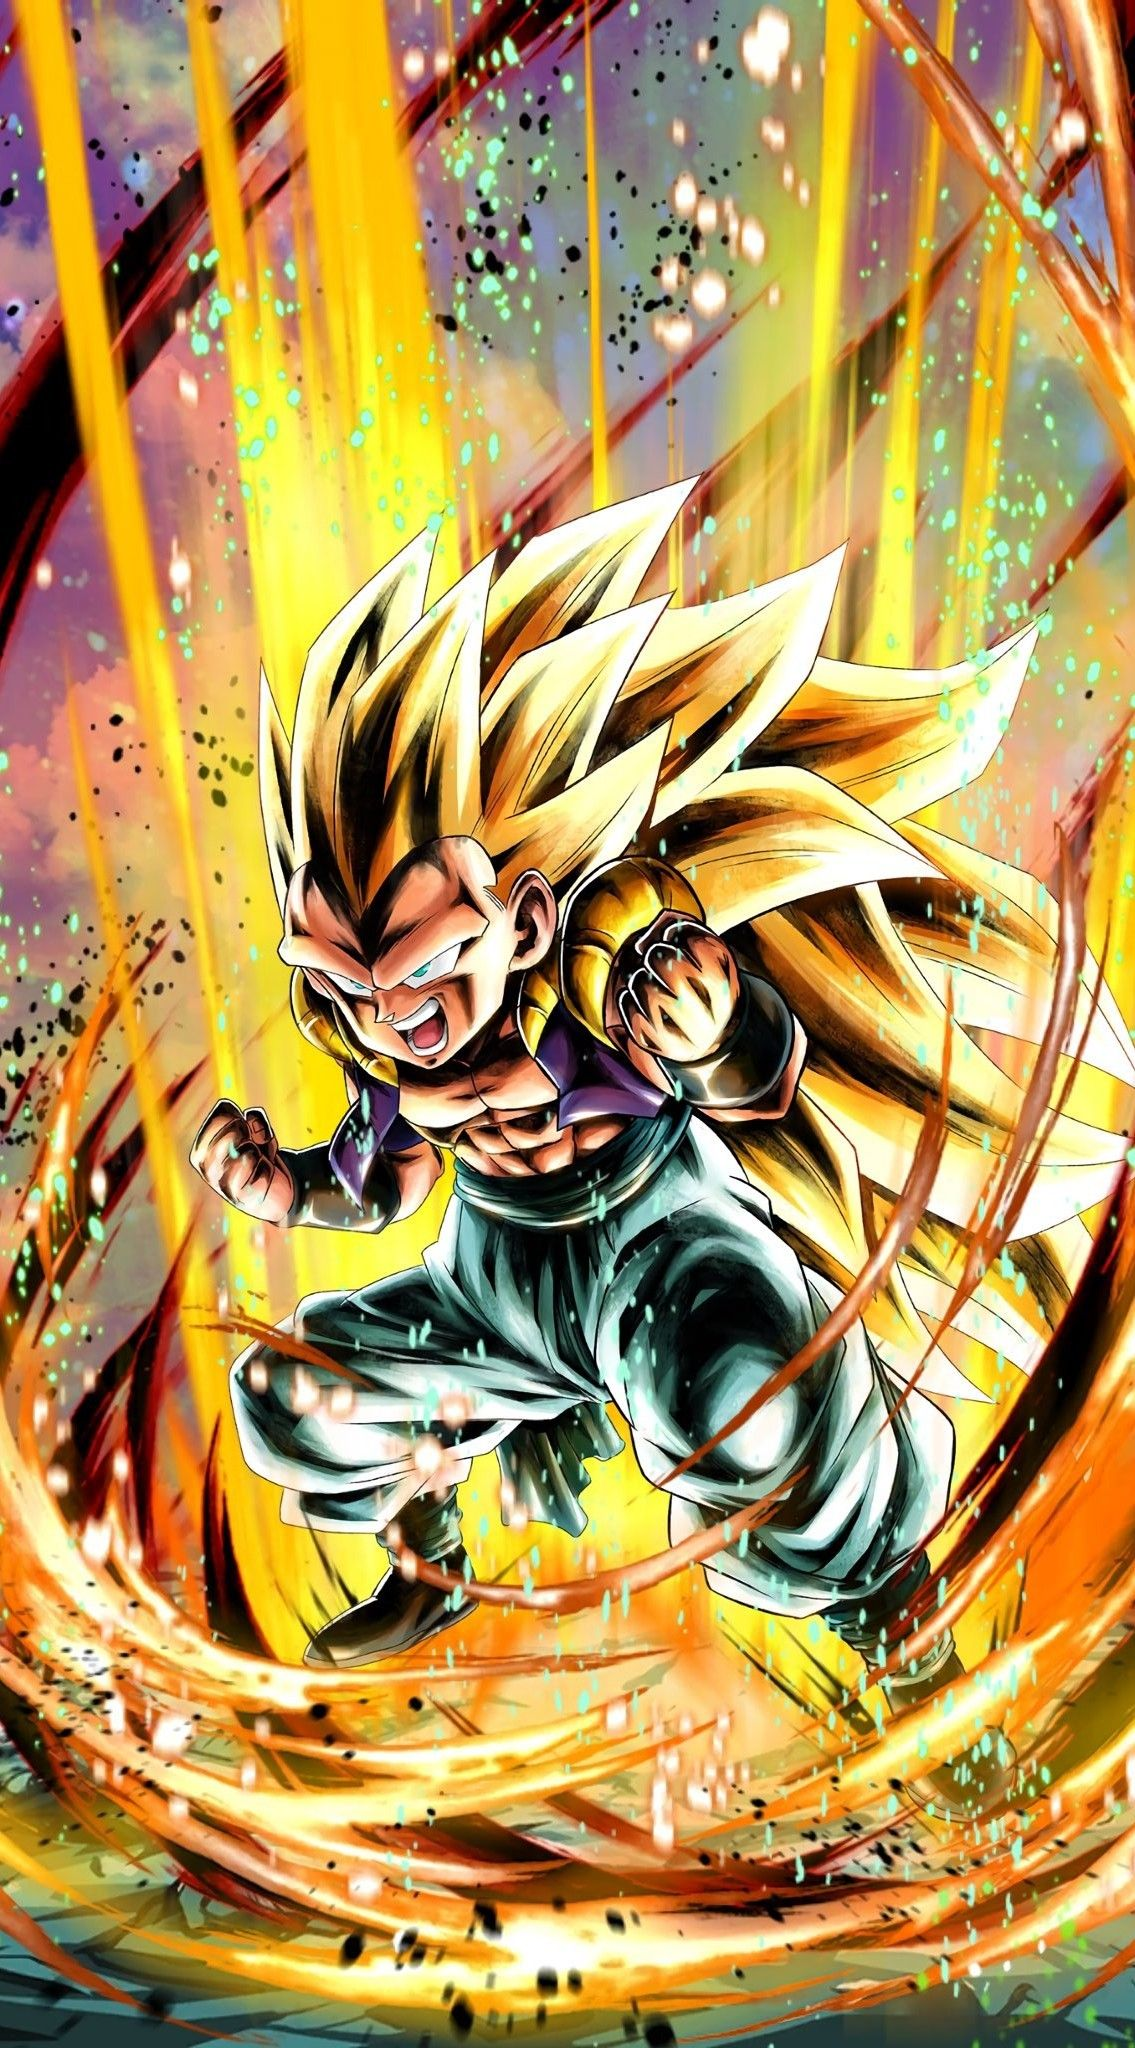 Gotenks Super Saiyan 3 Dragon Ball Legends In 2020 Dragon Ball Wallpapers Anime Dragon Ball Super Dragon Ball Artwork